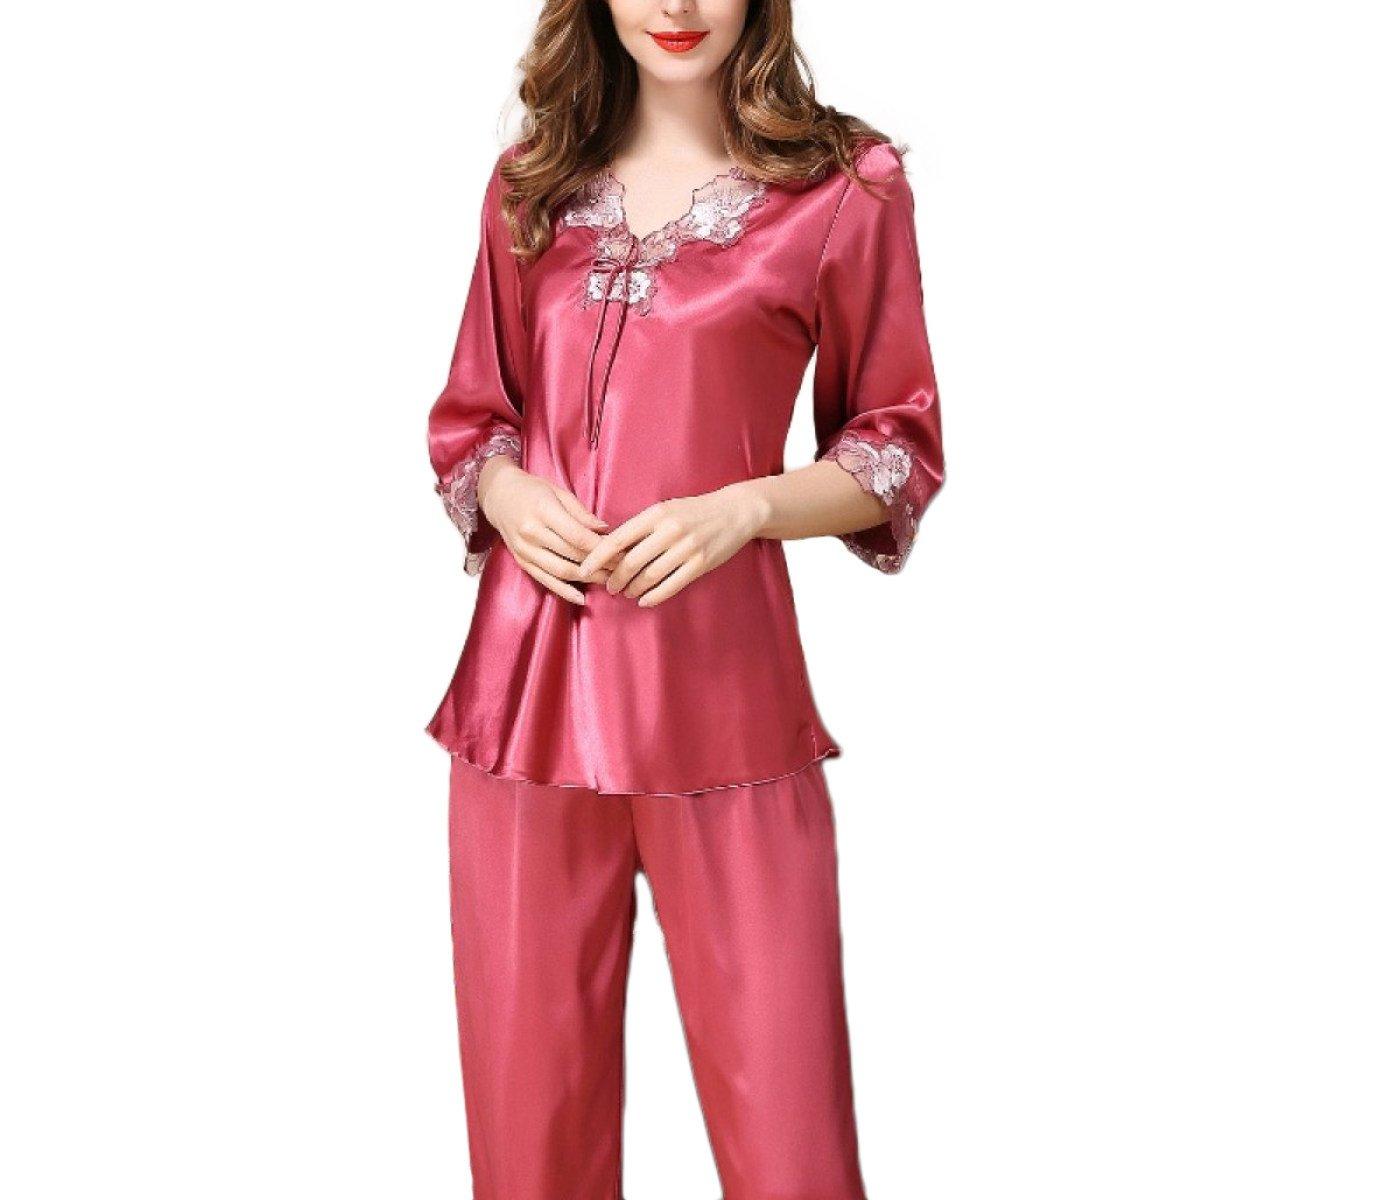 Conjunto De Pijama Pijama Mujer De Seda De Satén Para Mujer ...